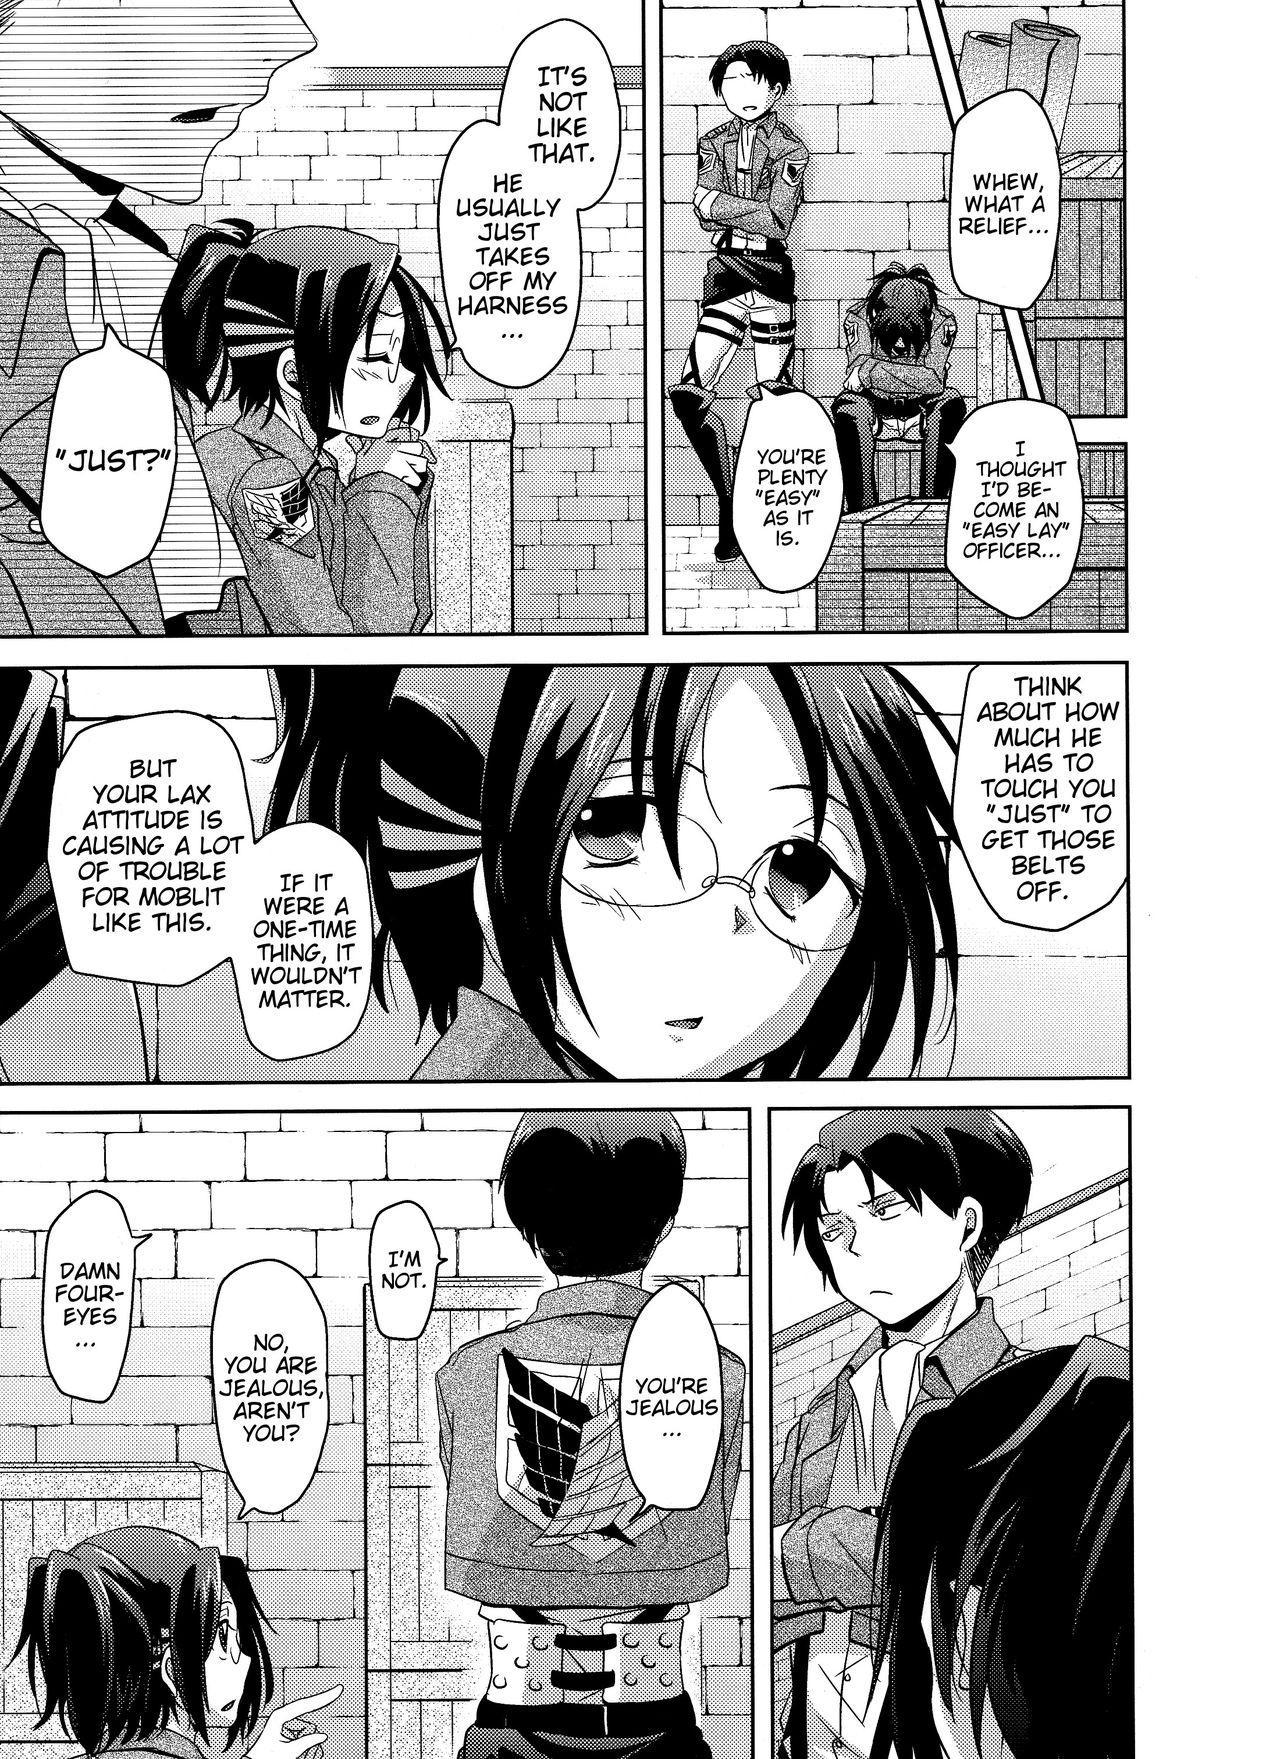 Shikkari shite kudasai Buntaichou. | Please take this seriously, Squad Leader. 14